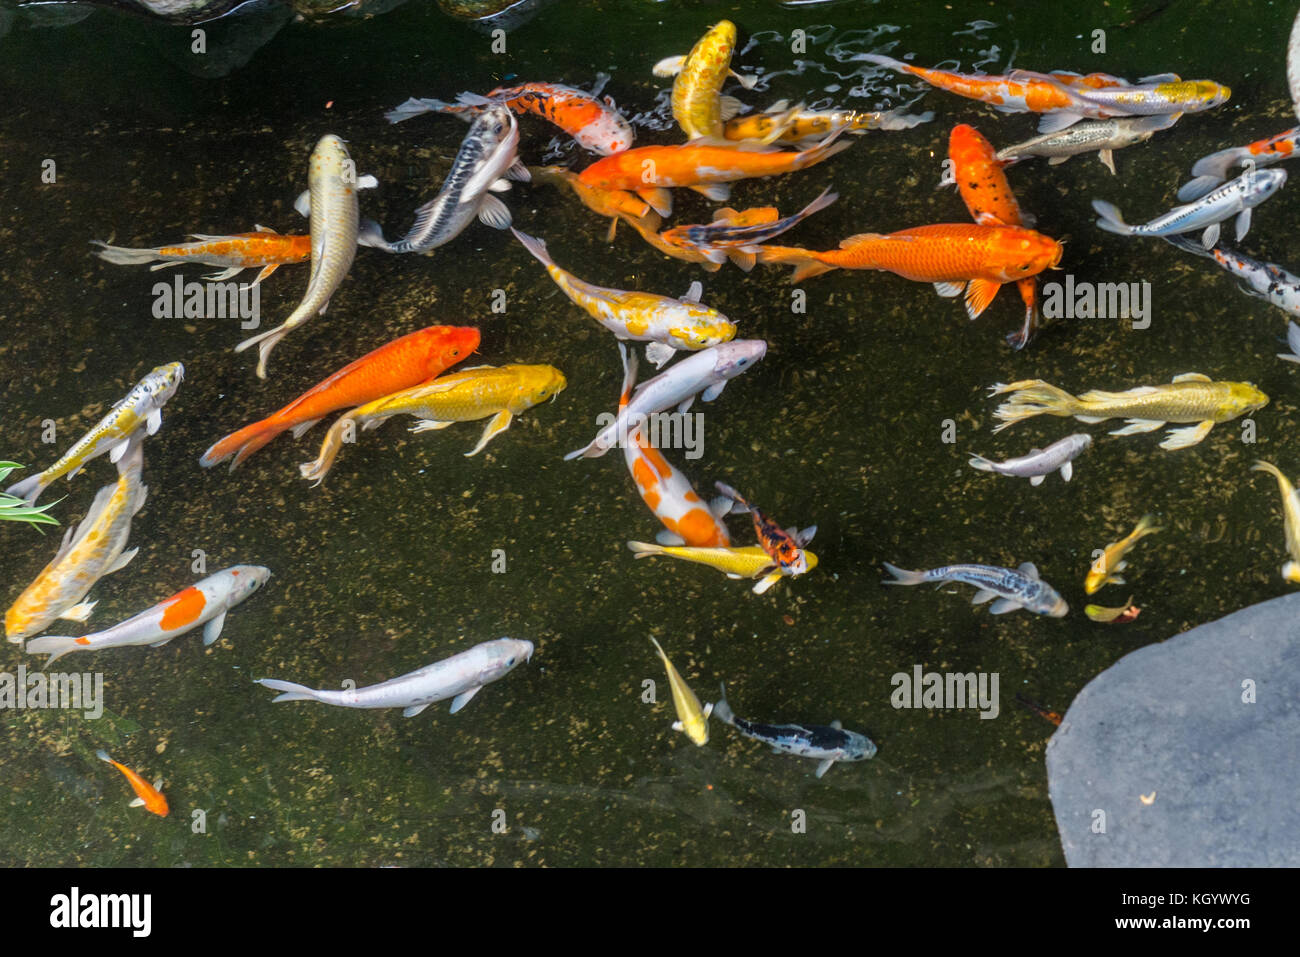 Japanese koi fish stock photos japanese koi fish stock for Koi carp colours